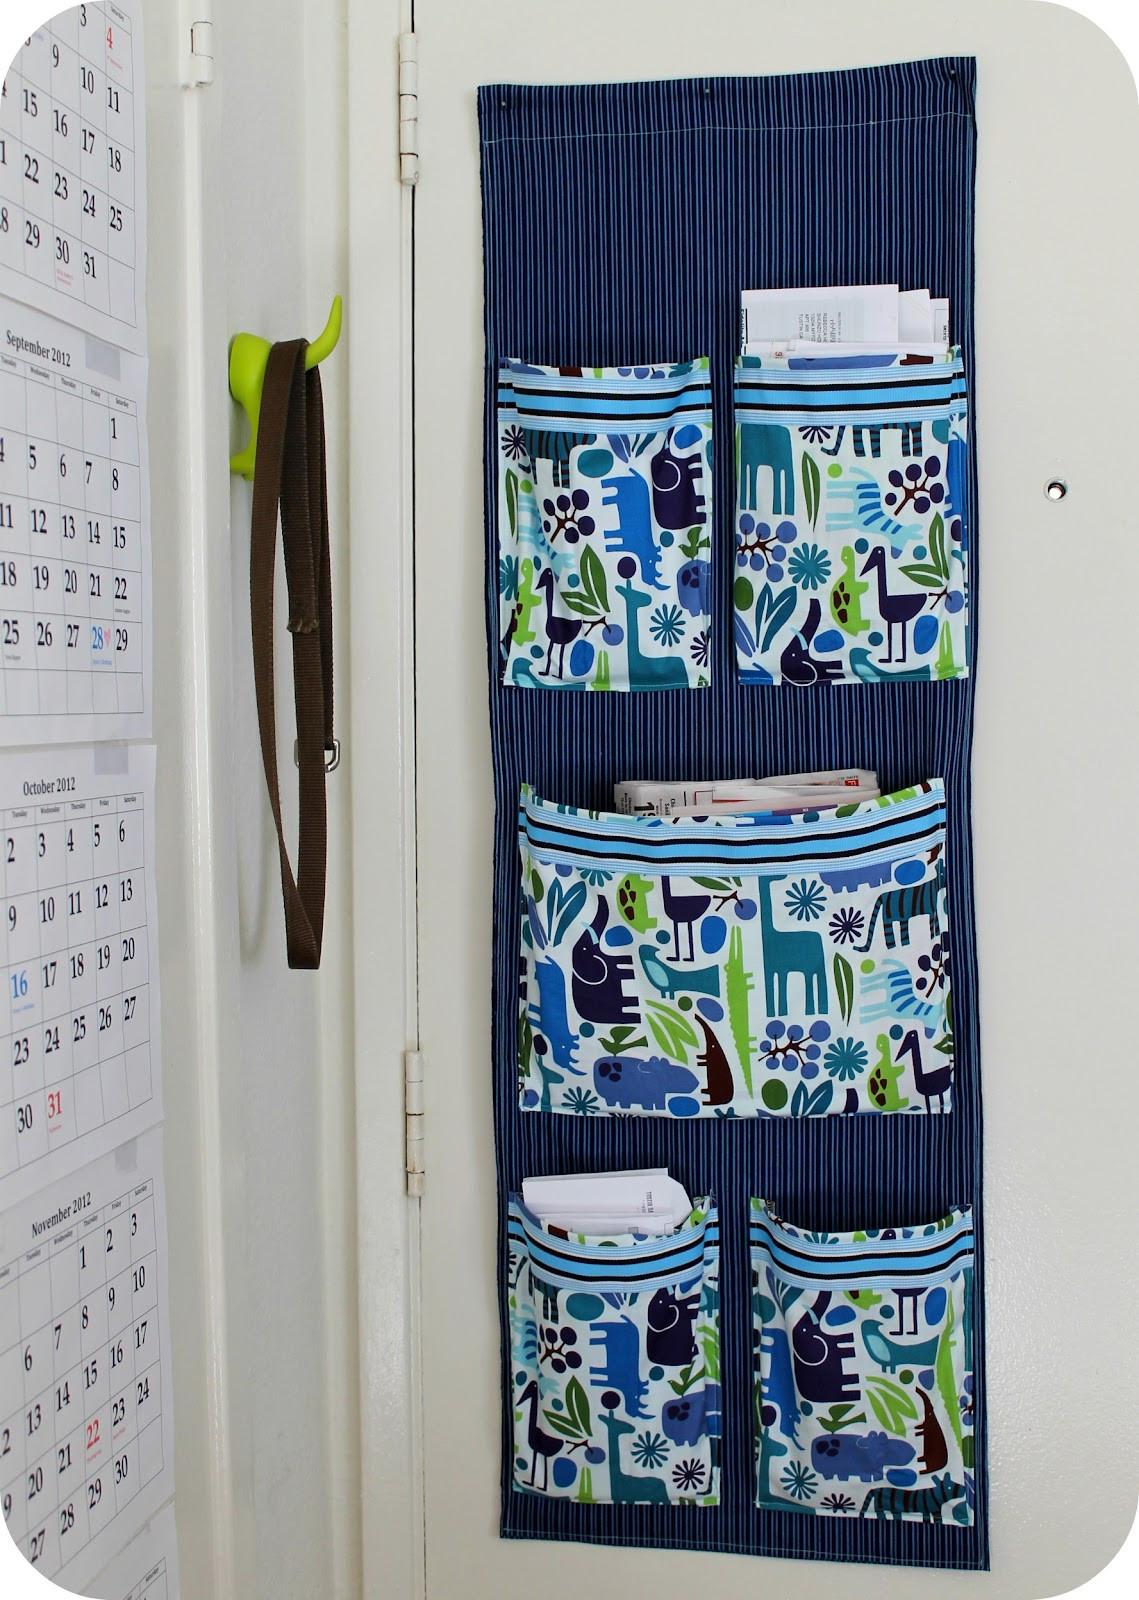 Organizer Diy  DiY Project Sew a Fabric Mail Organizer for the Wall